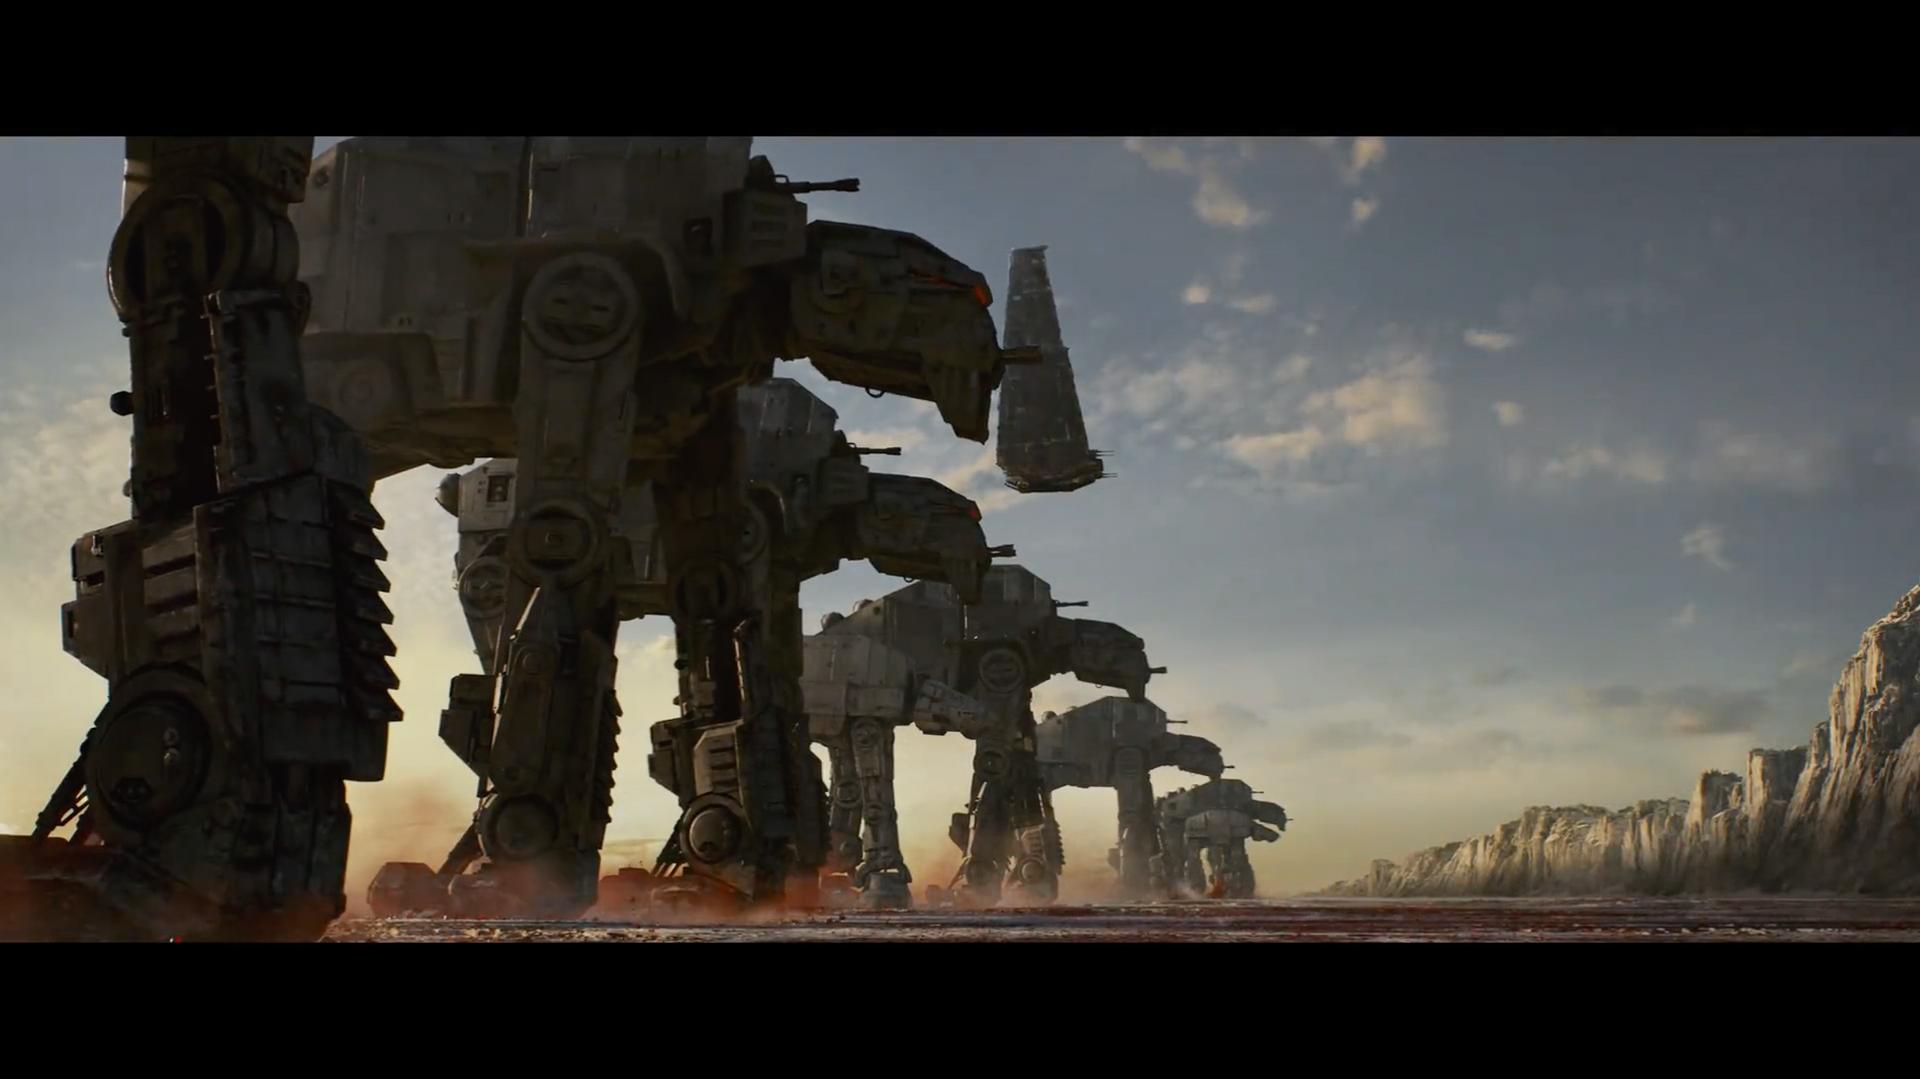 STAR WARS: THE LAST JEDI - The Art of VFXThe Art of VFX